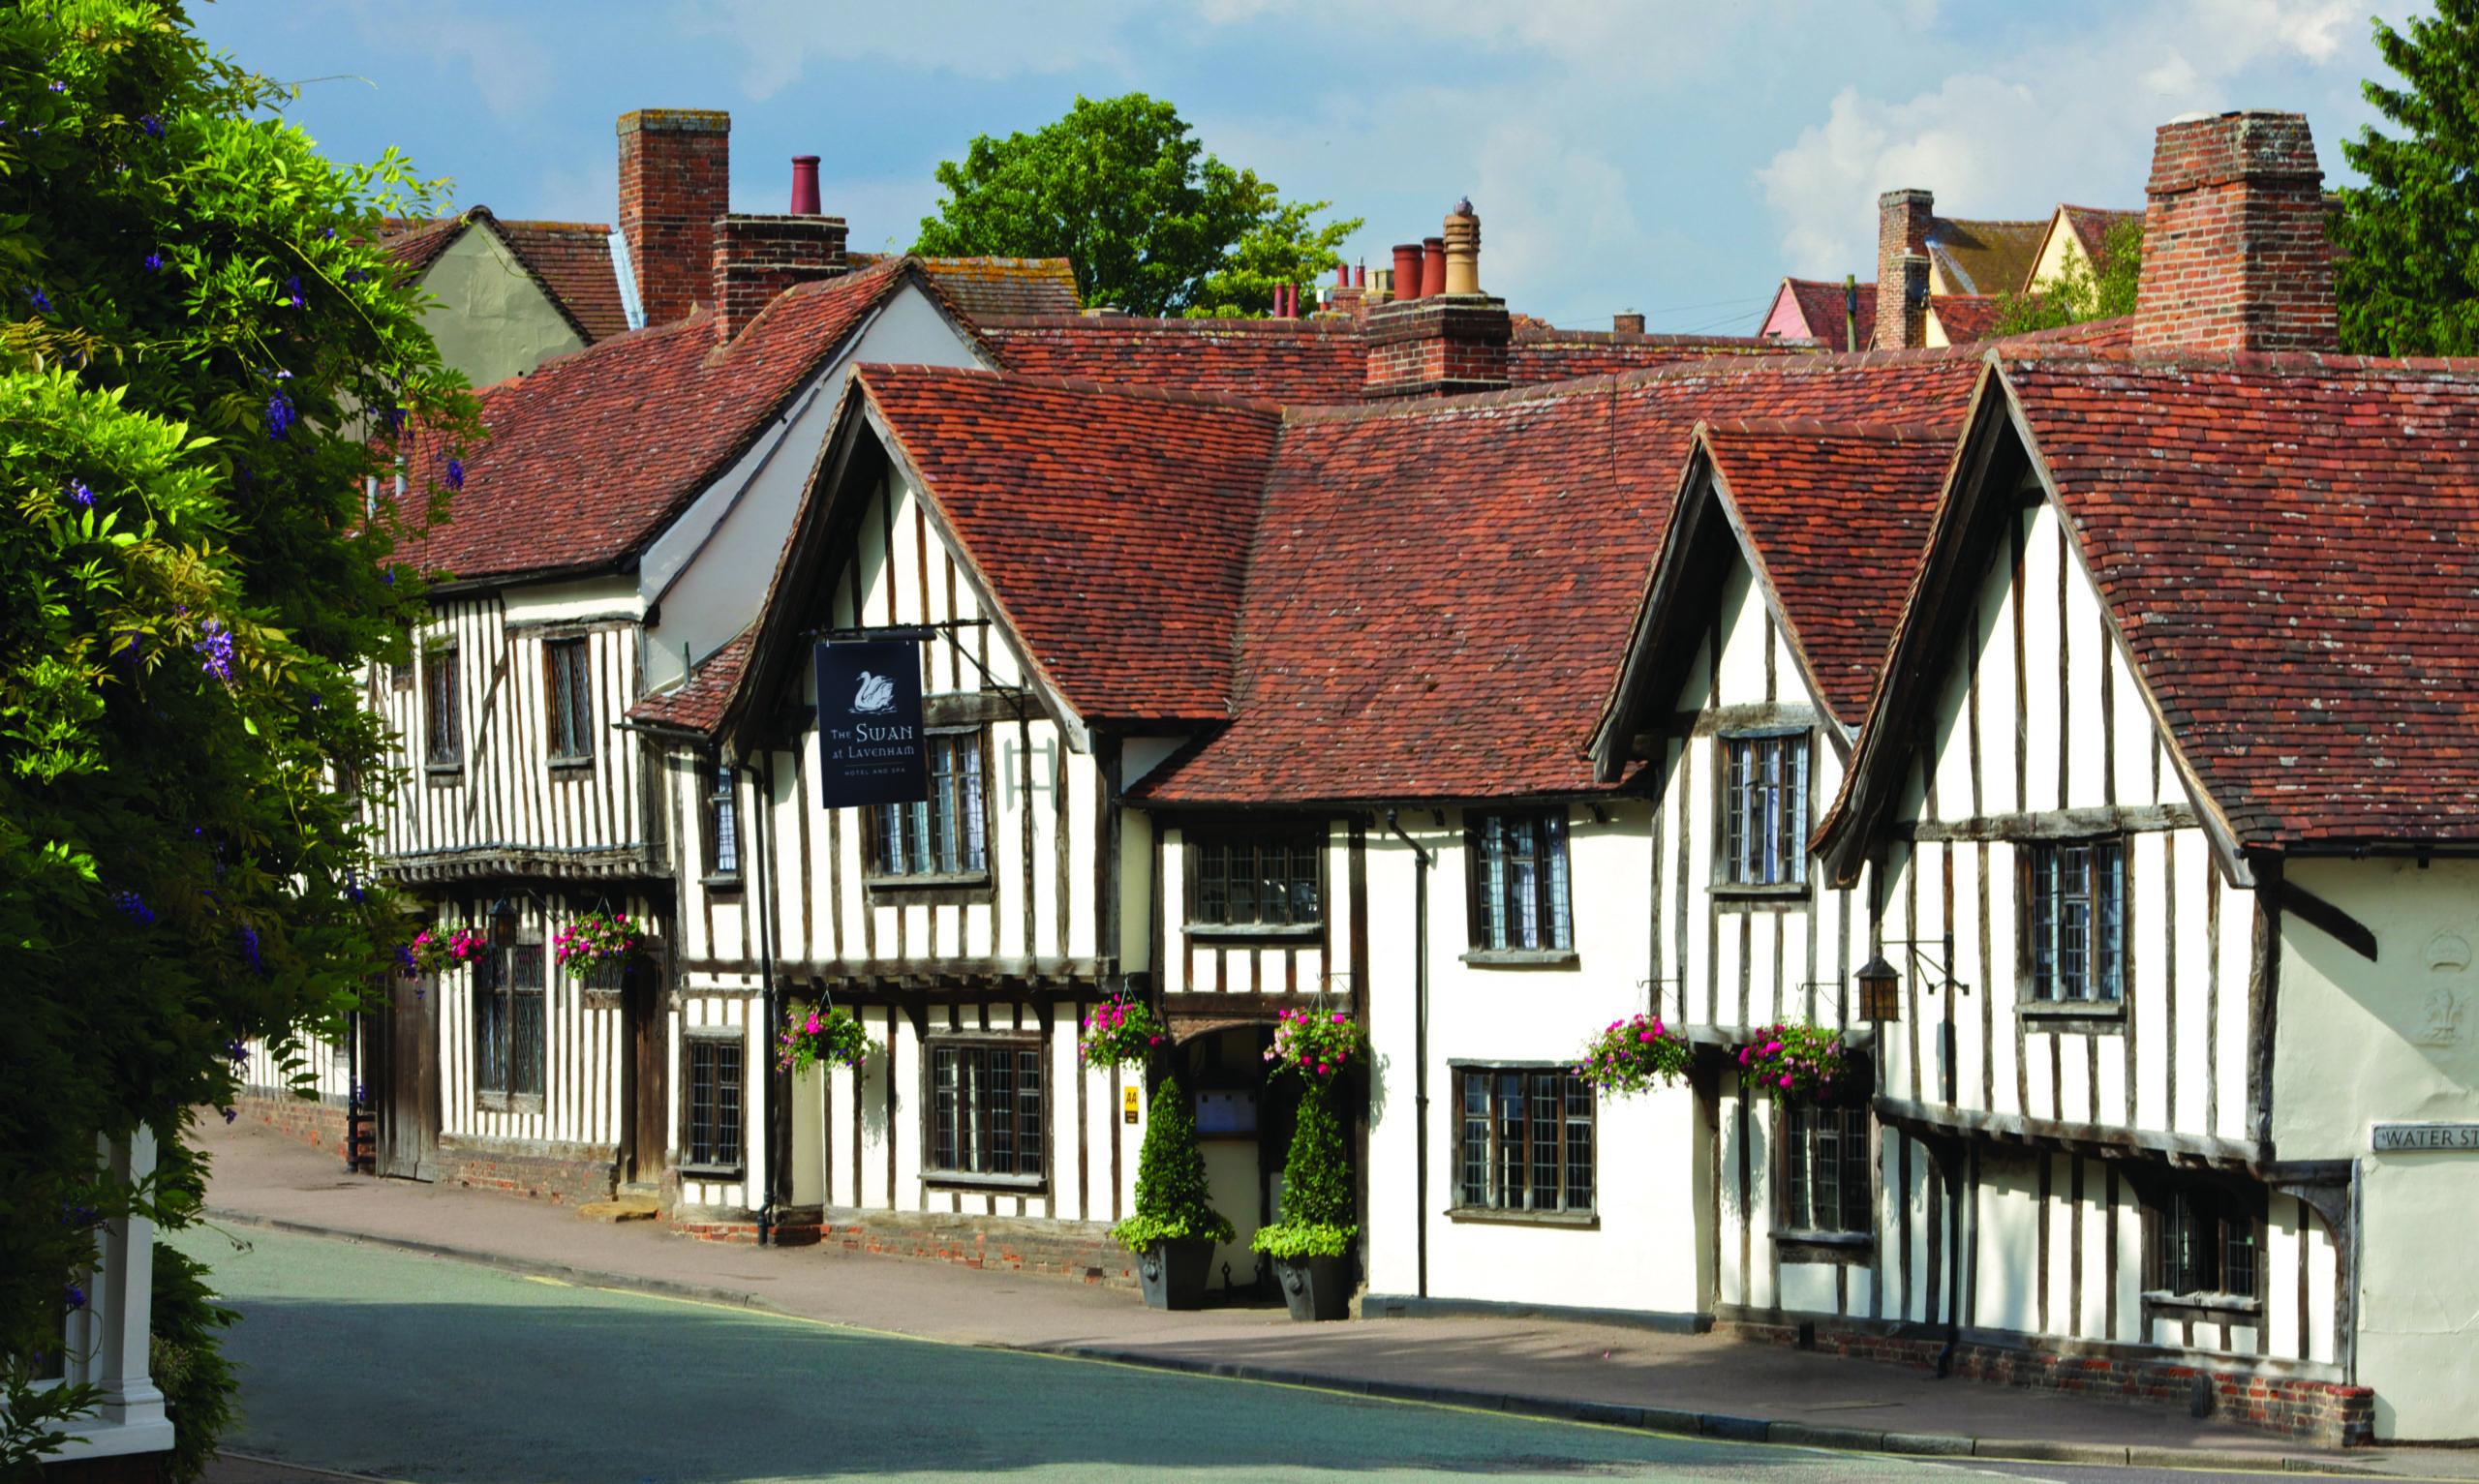 The Swan Inn at Lavenham